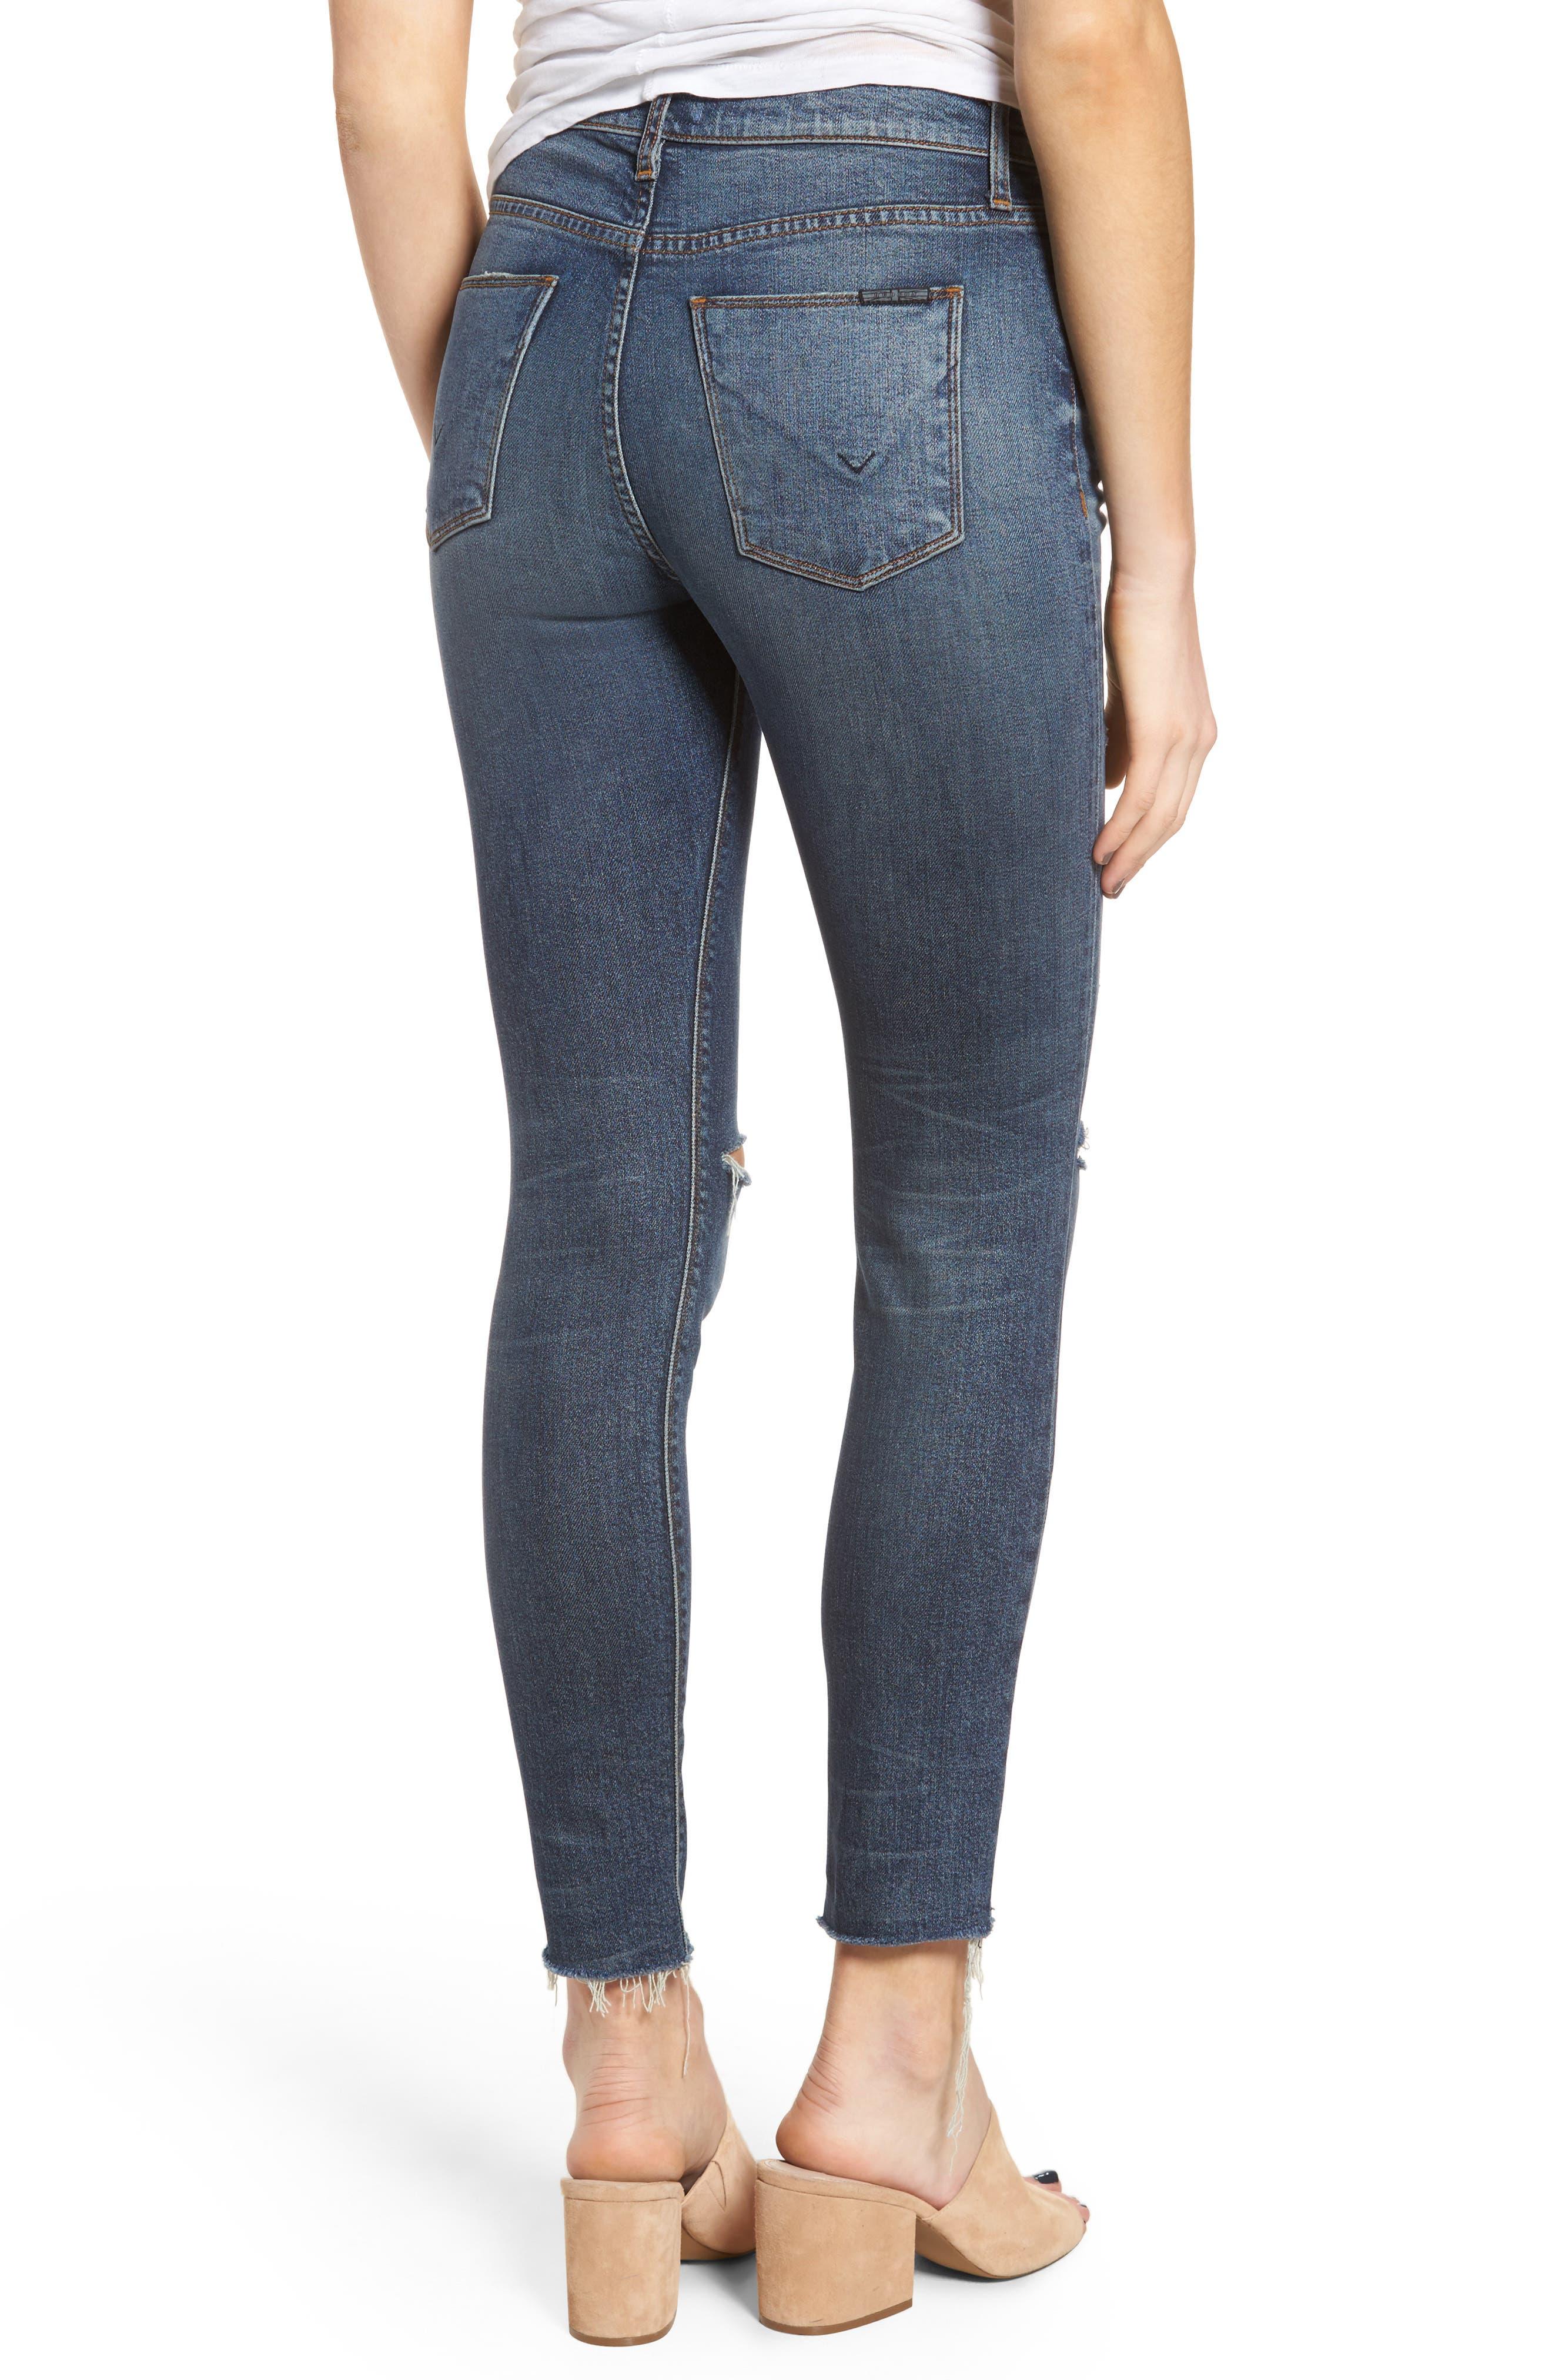 Barbara High Waist Skinny Jeans,                             Alternate thumbnail 2, color,                             429